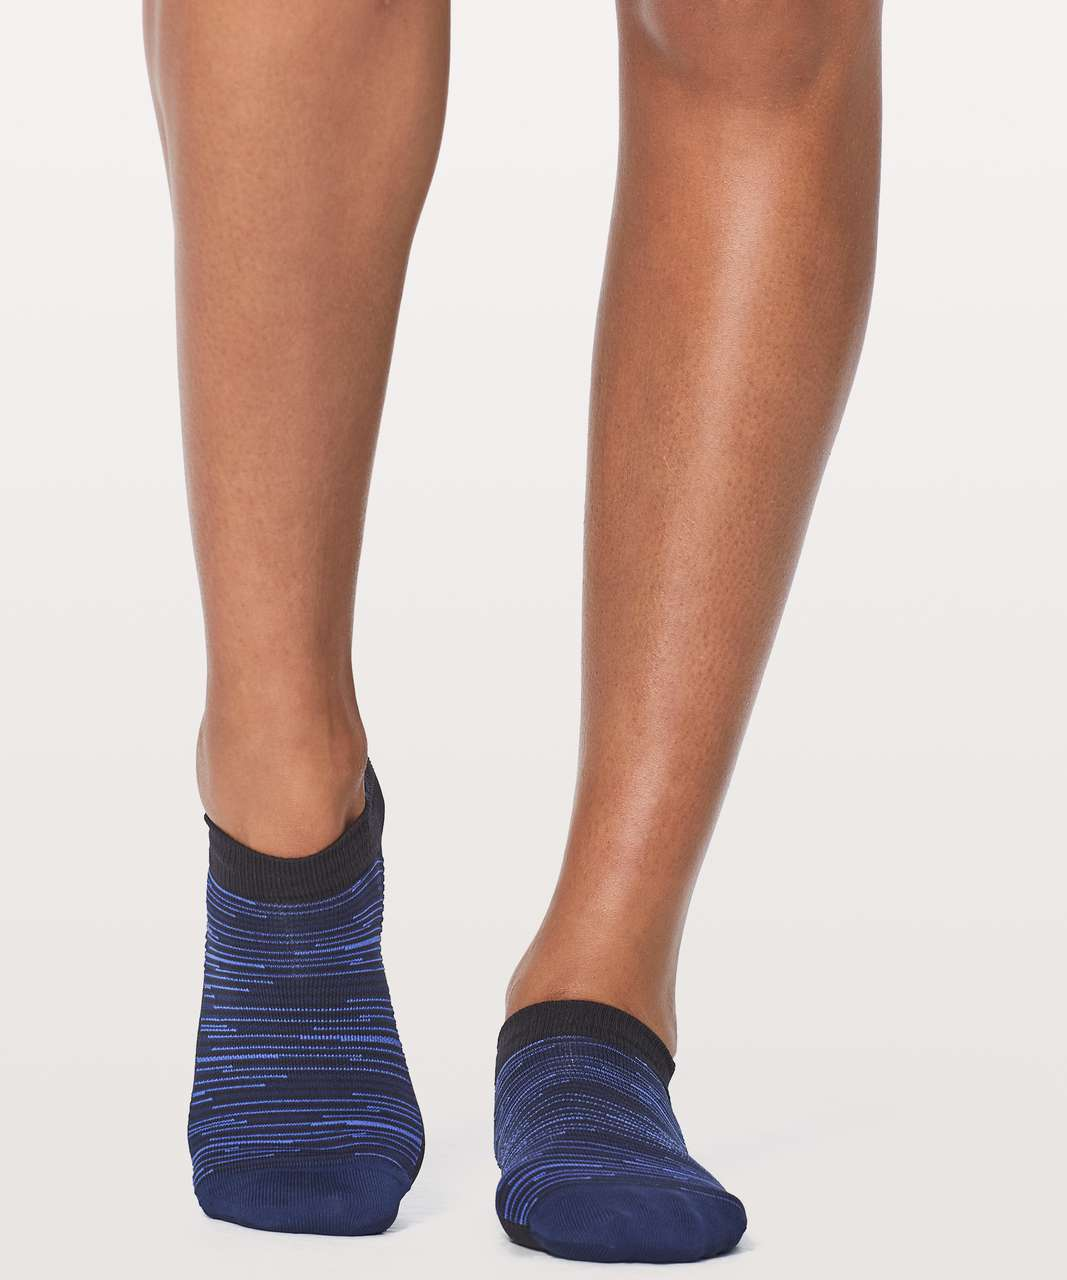 Lululemon Play All Day Sock - Hero Blue / Blazer Blue / Black